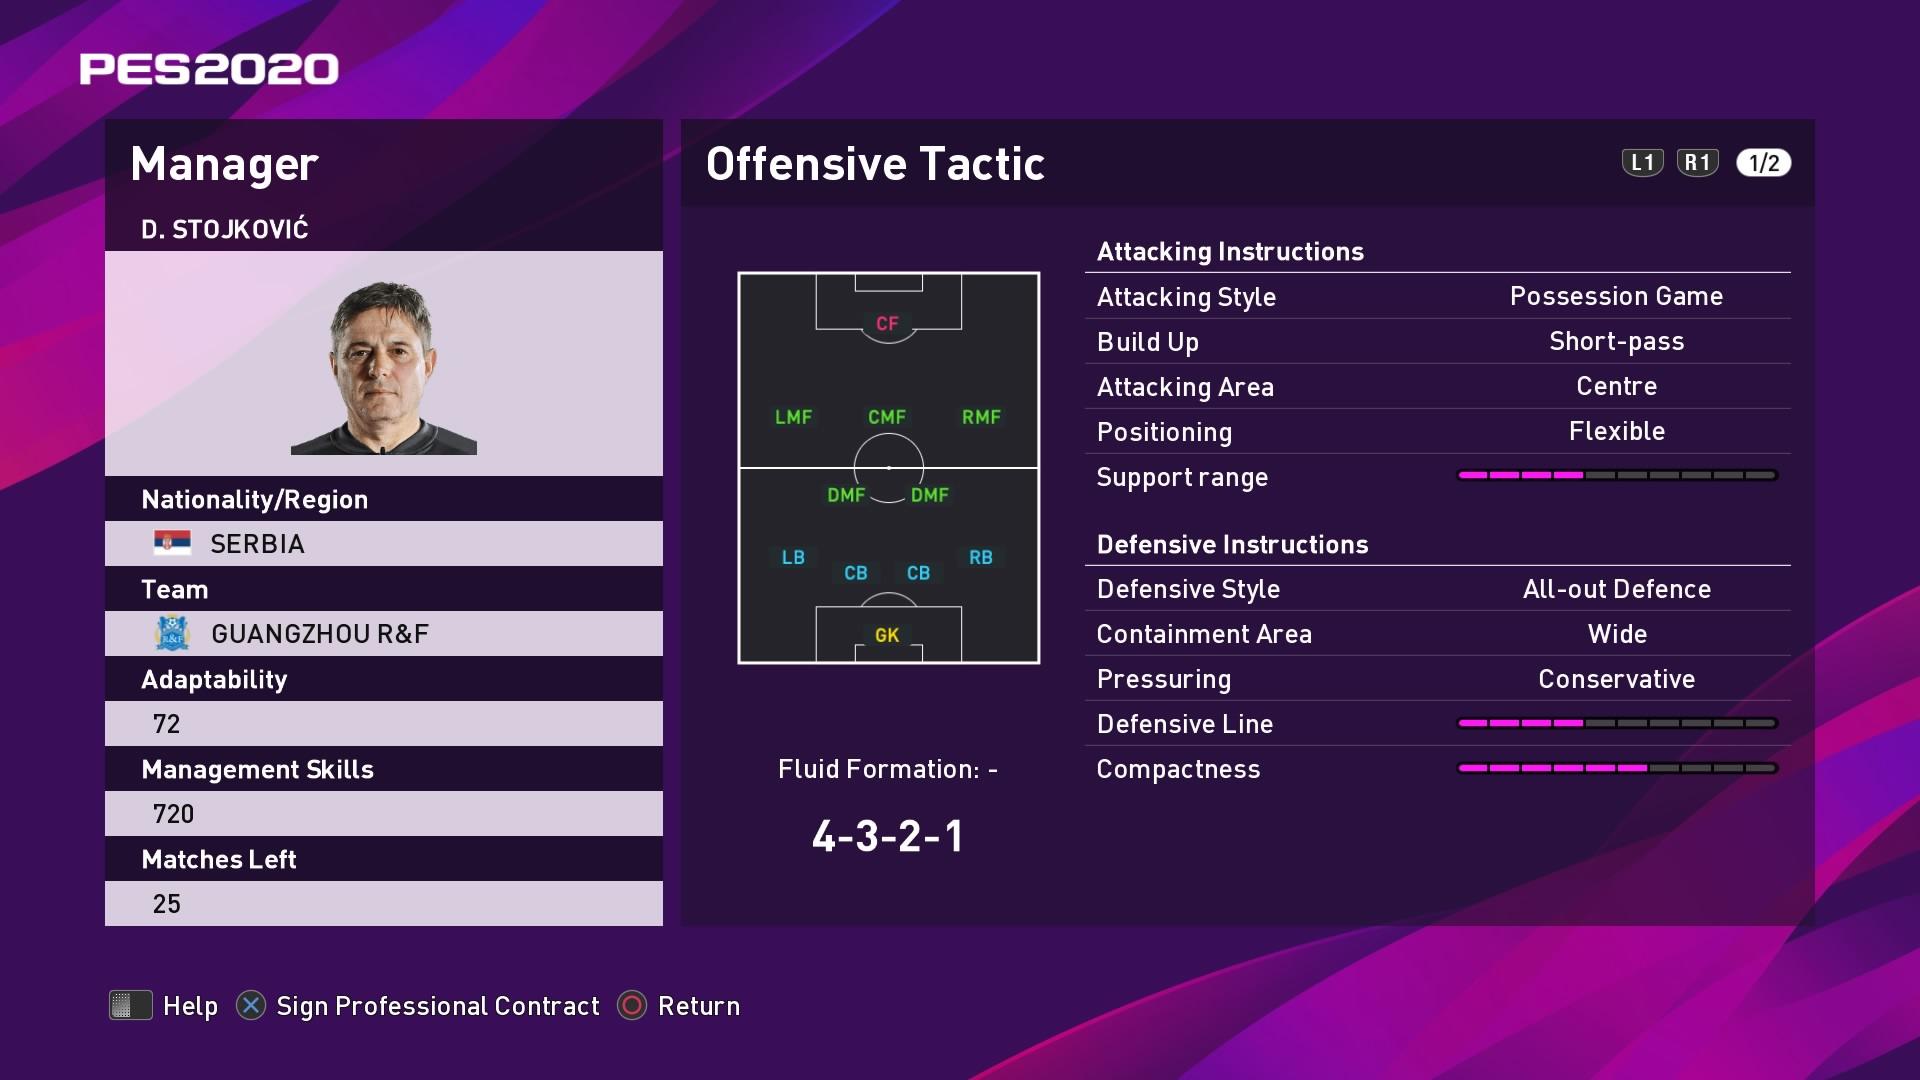 D. Stojković (Dragan Stojković) Offensive Tactic in PES 2020 myClub